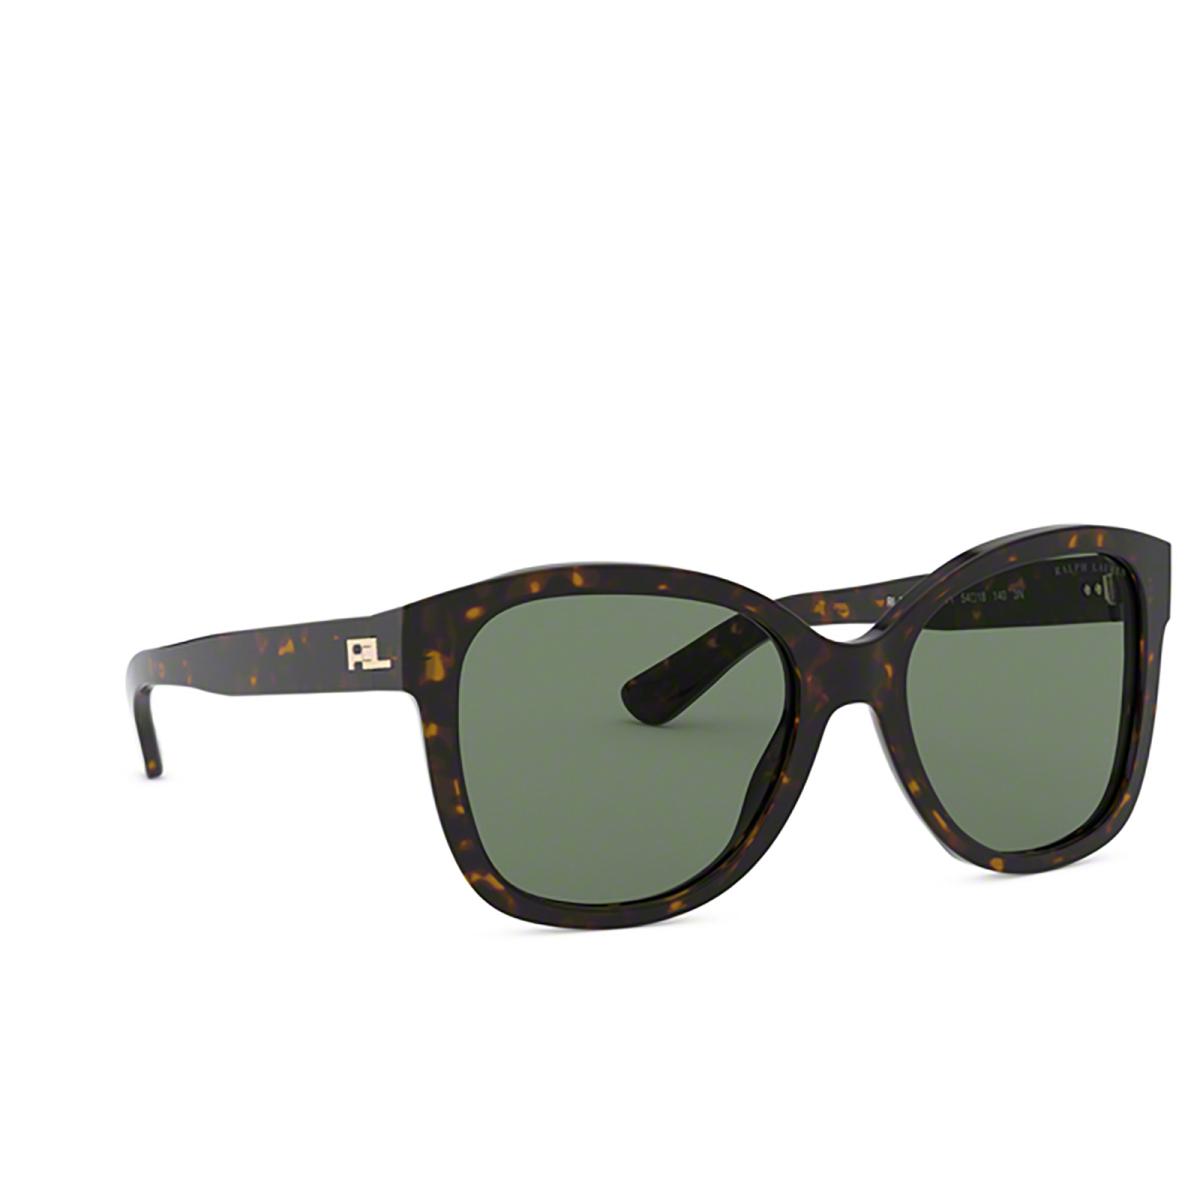 Ralph Lauren® Butterfly Sunglasses: RL8180 color Shiny Dark Havana 500371 - three-quarters view.